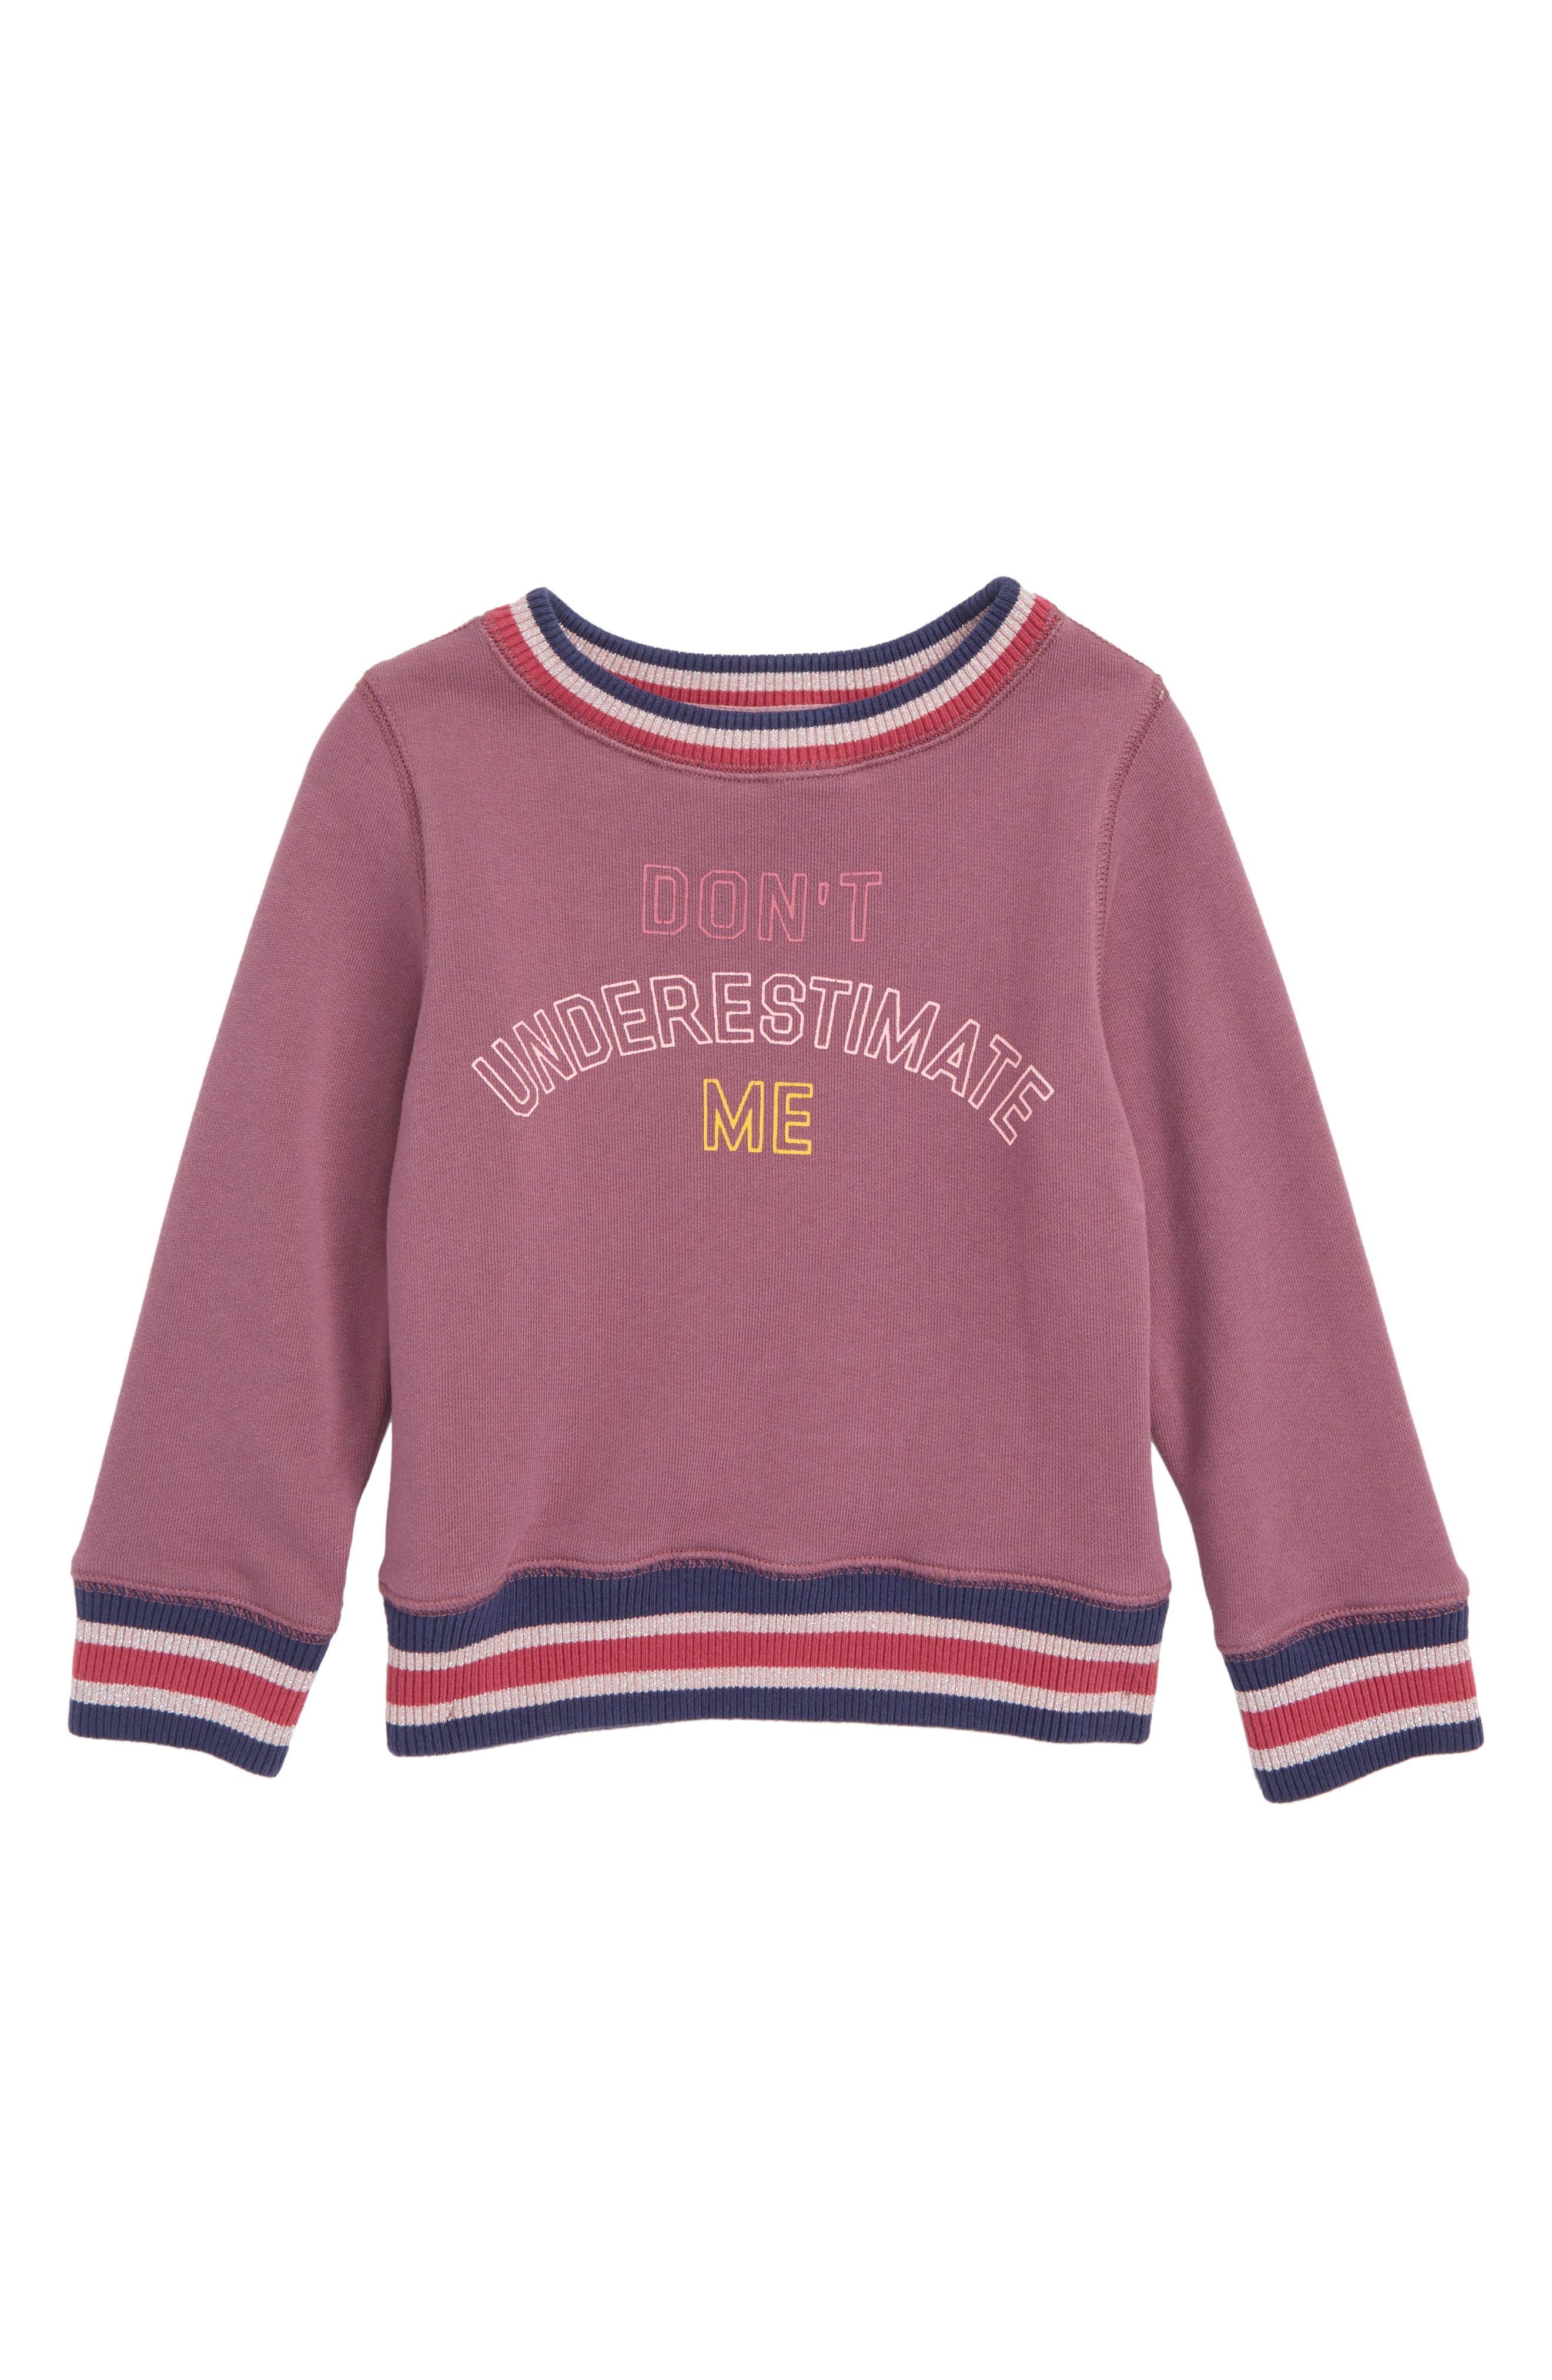 Don't Underestimate Me Sweatshirt,                             Main thumbnail 1, color,                             500